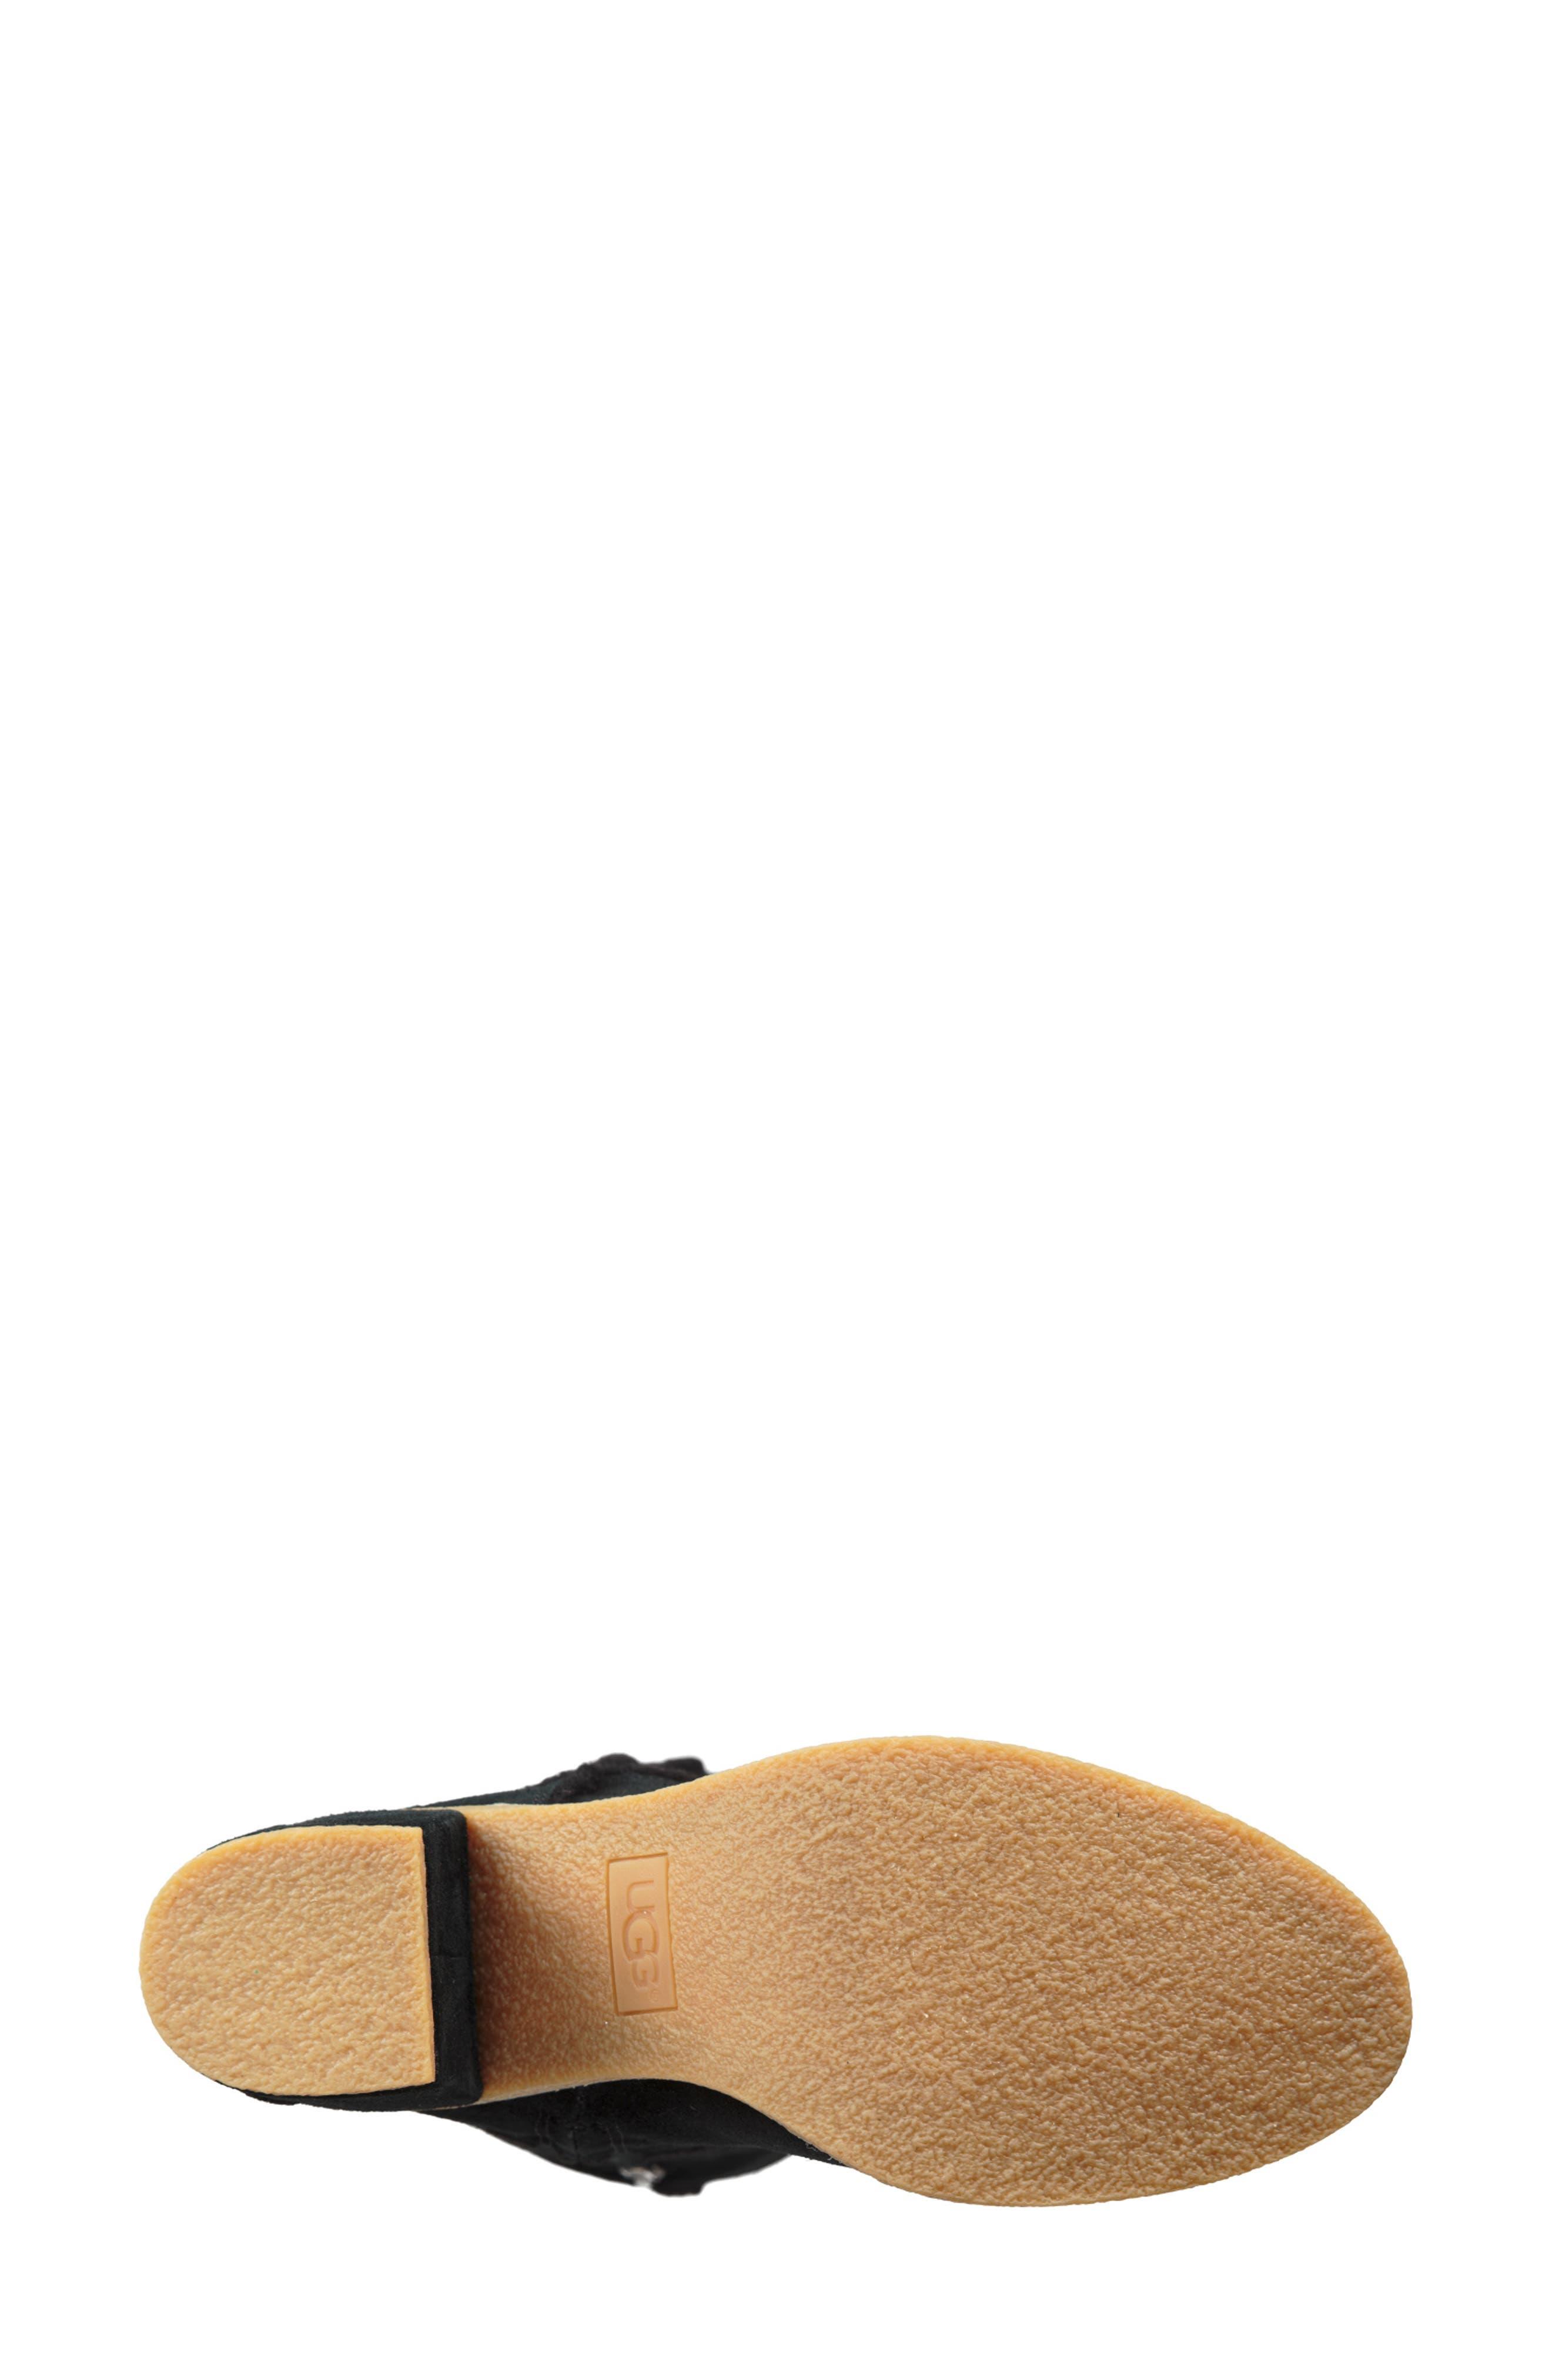 Kasen II Knee High Boot,                             Alternate thumbnail 5, color,                             BLACK SUEDE